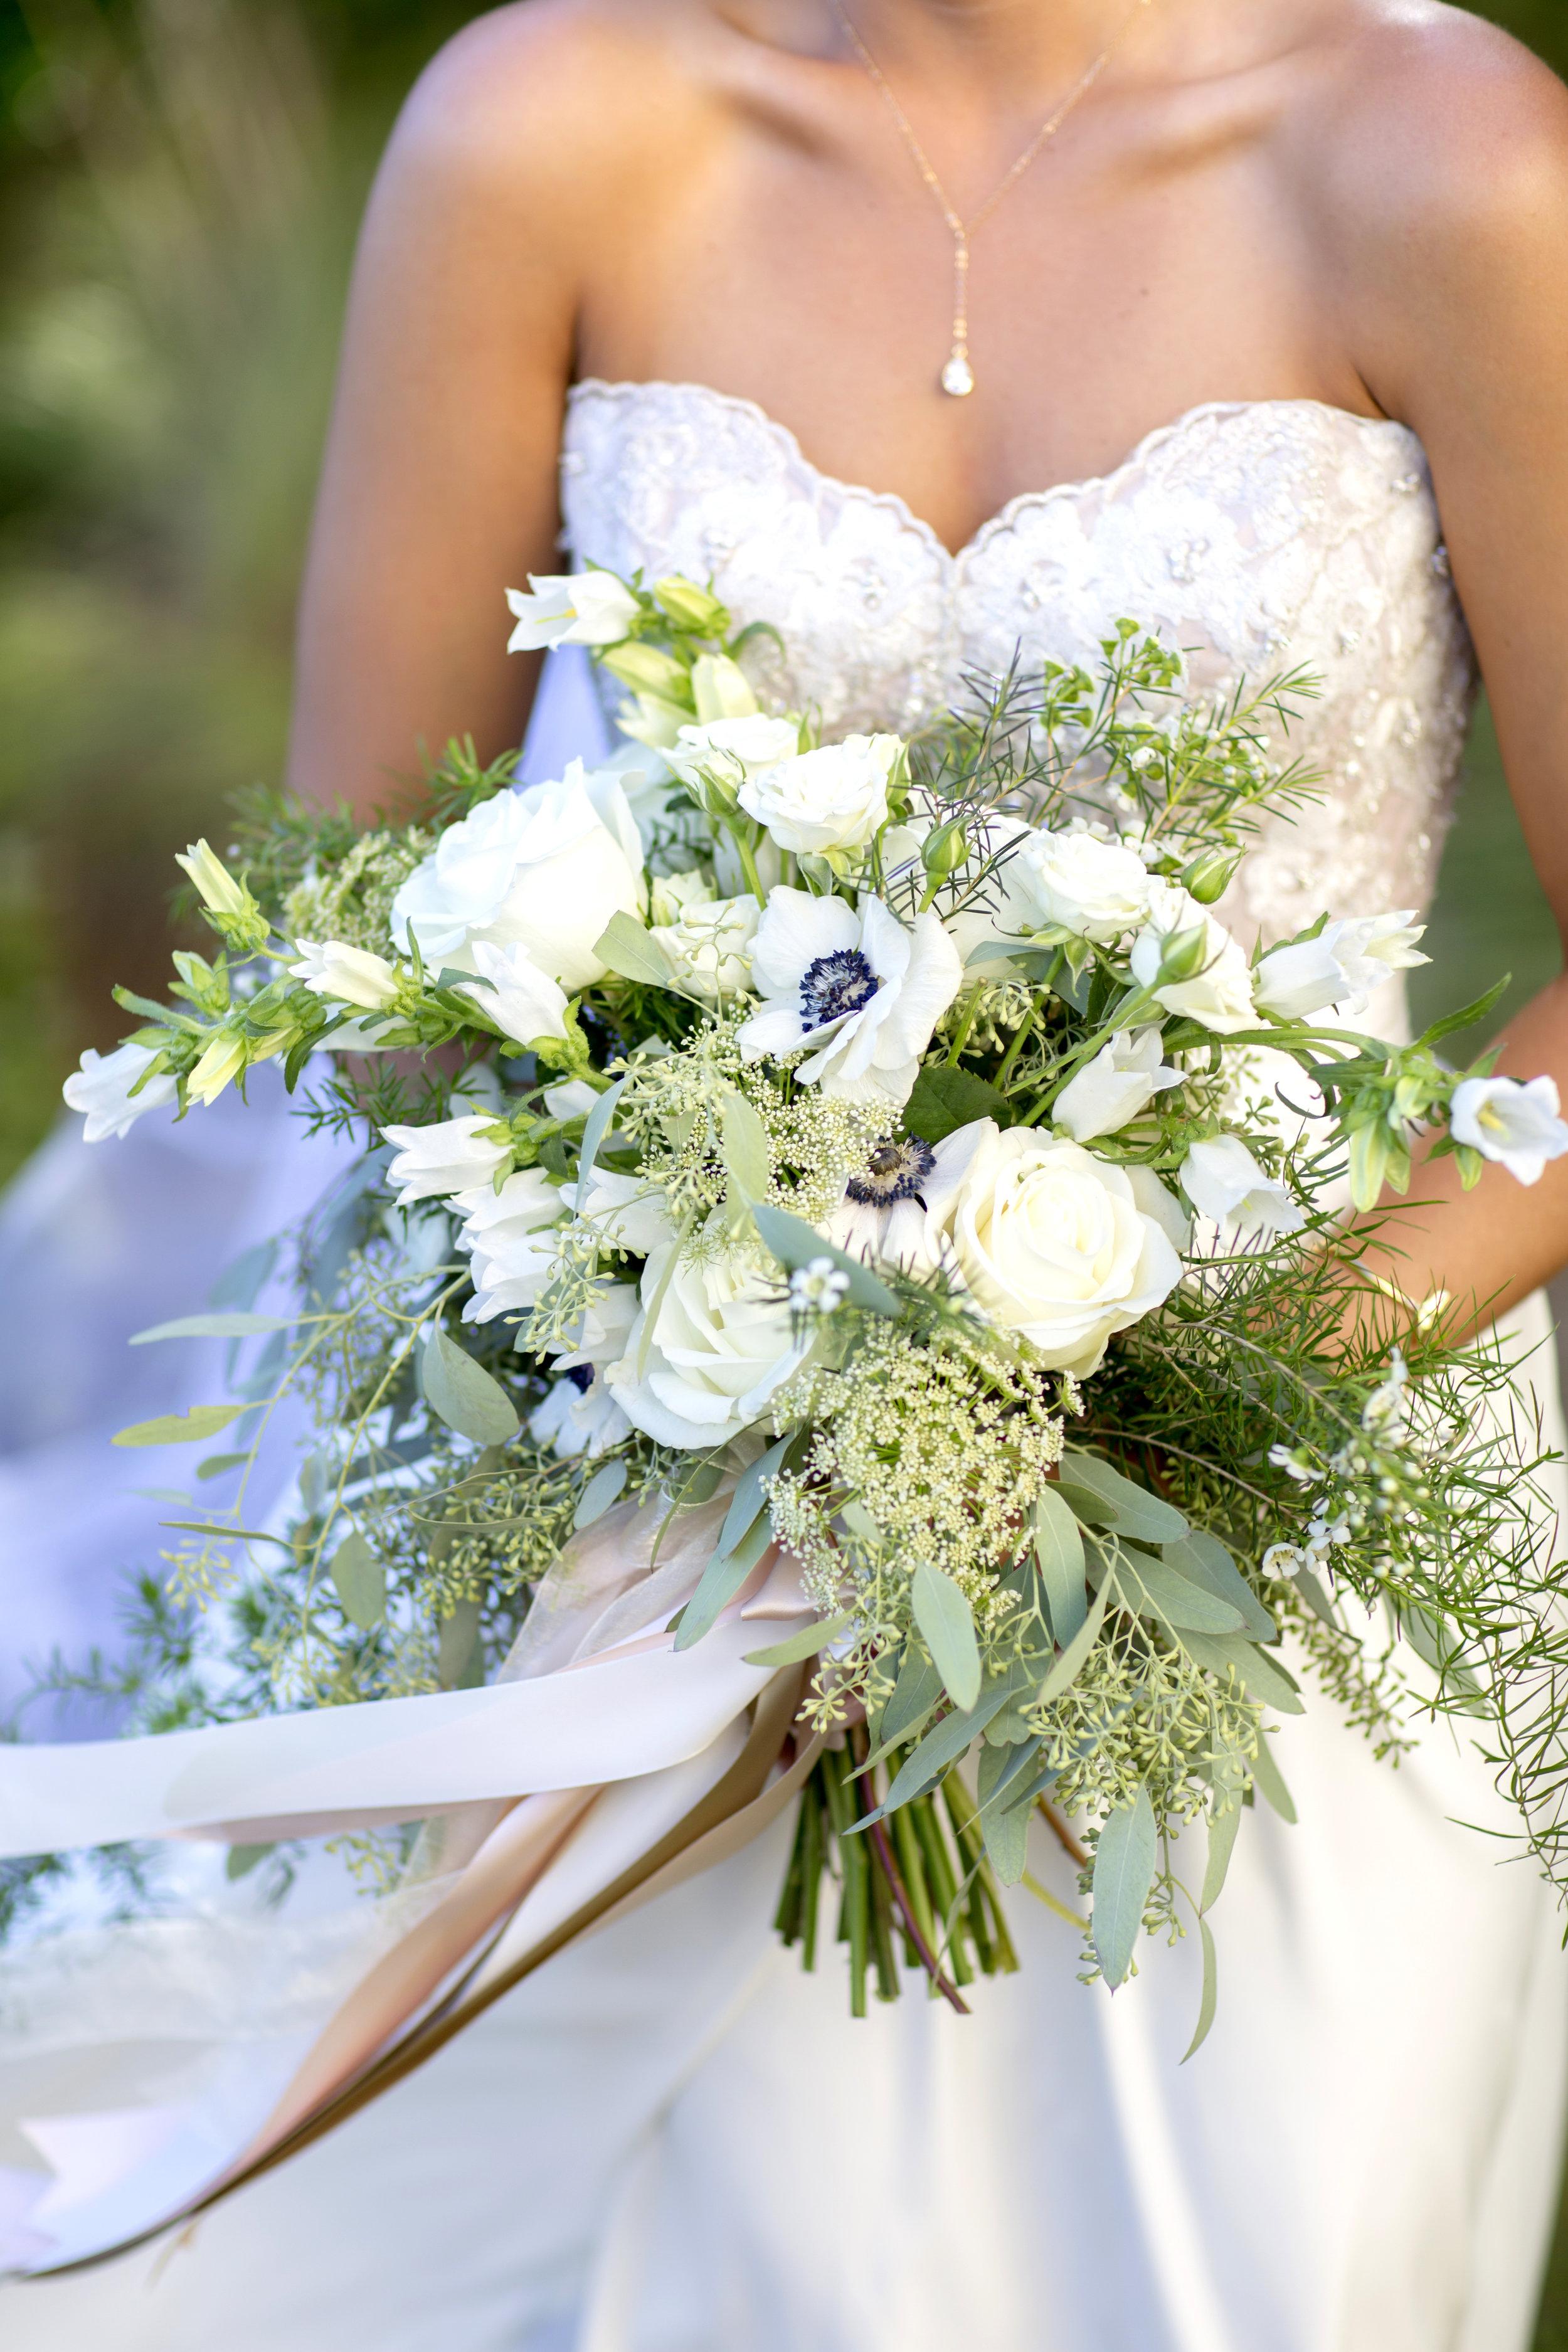 20170827_carroll_wedding_0683.jpg